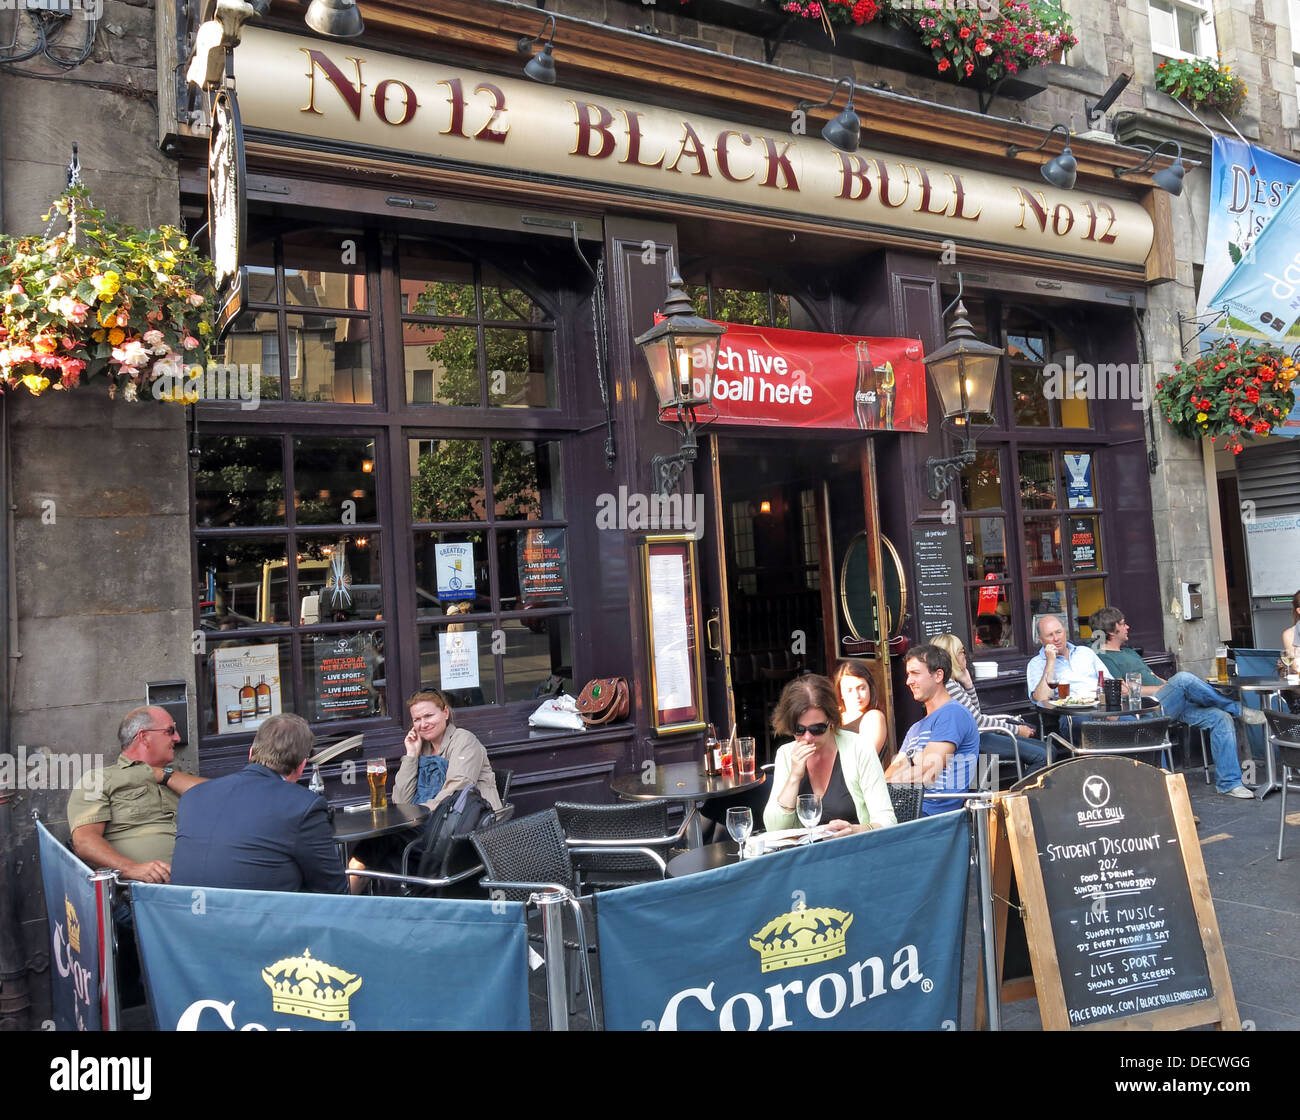 No 12,Black Bull,12 Grassmarket,Old Town,Edinburgh,EH1 2JU,Scotland,UK,12,Black,Bull,old,town,drinkers,customers,with,on street drinking,on,street,drinking,tourist,tourism,EH12JU,pub,bar,GoTonySmith,oldtown,Buy Pictures of,Buy Images Of